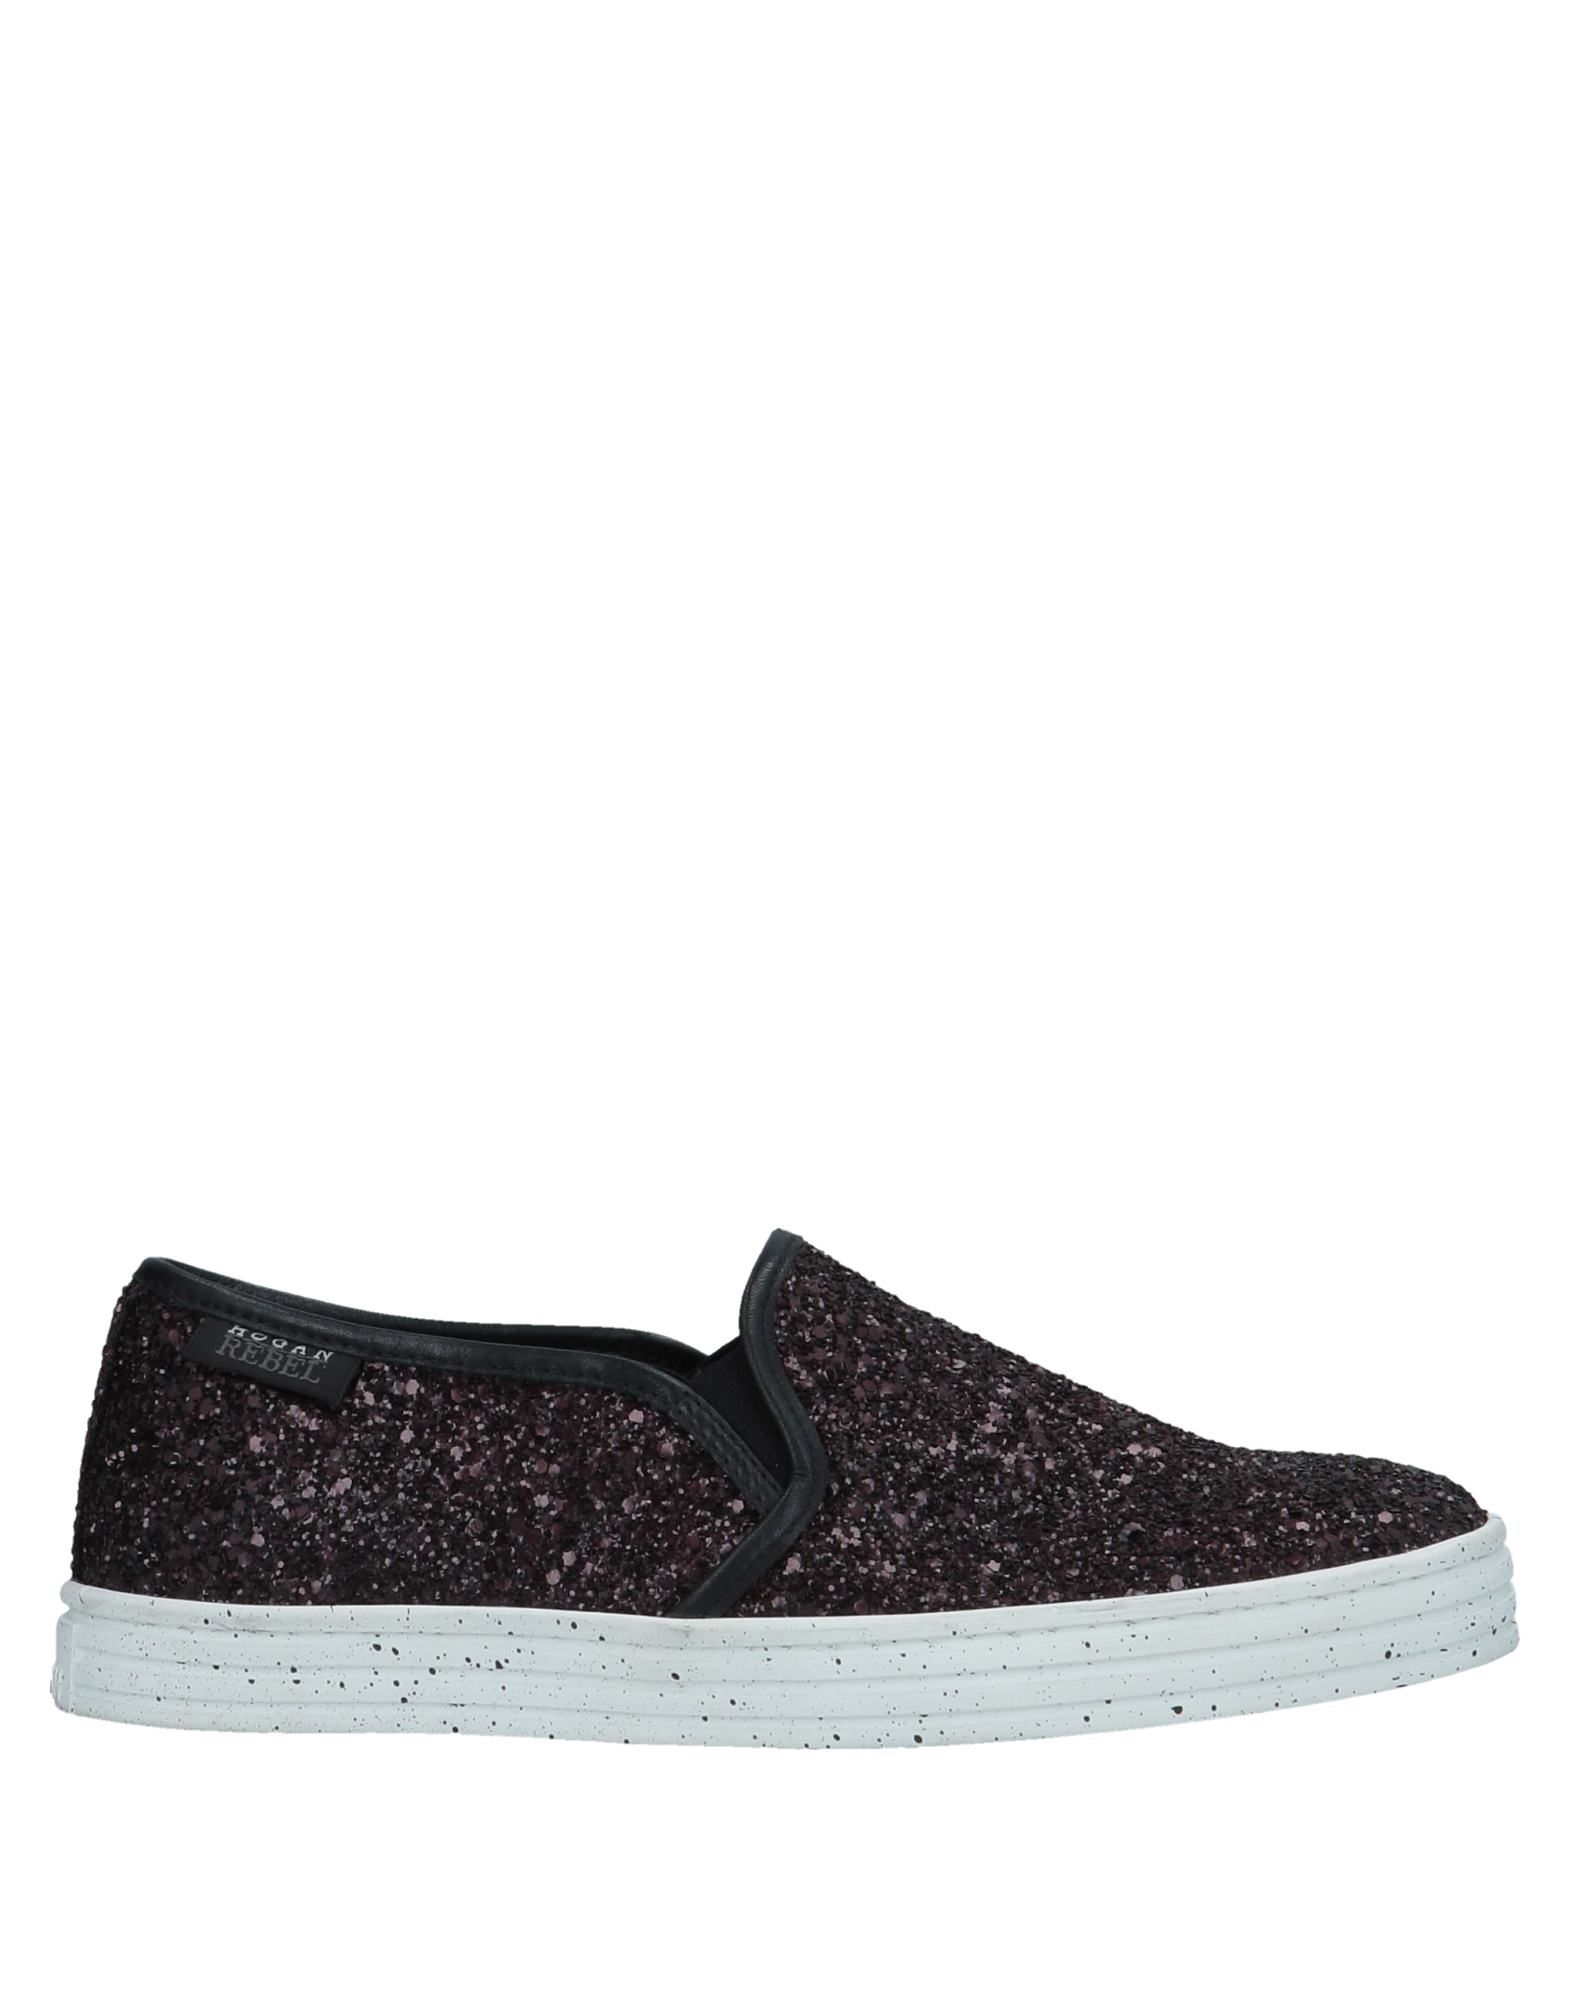 Hogan Rebel Sneakers Damen  11539878DIGut aussehende strapazierfähige Schuhe